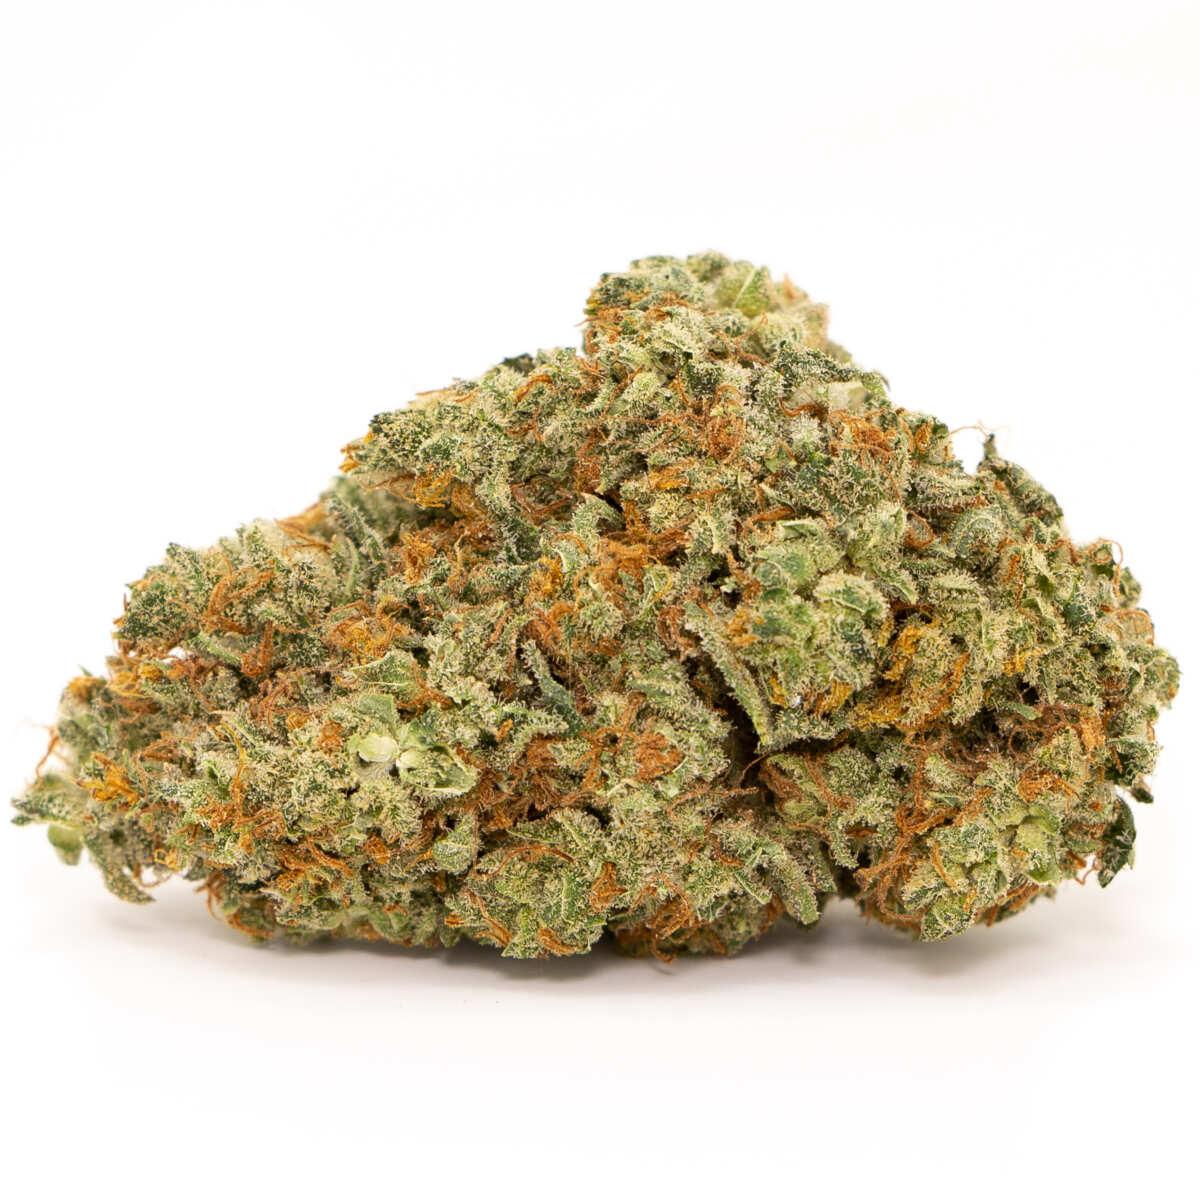 Juicy Fruit cannabis bud